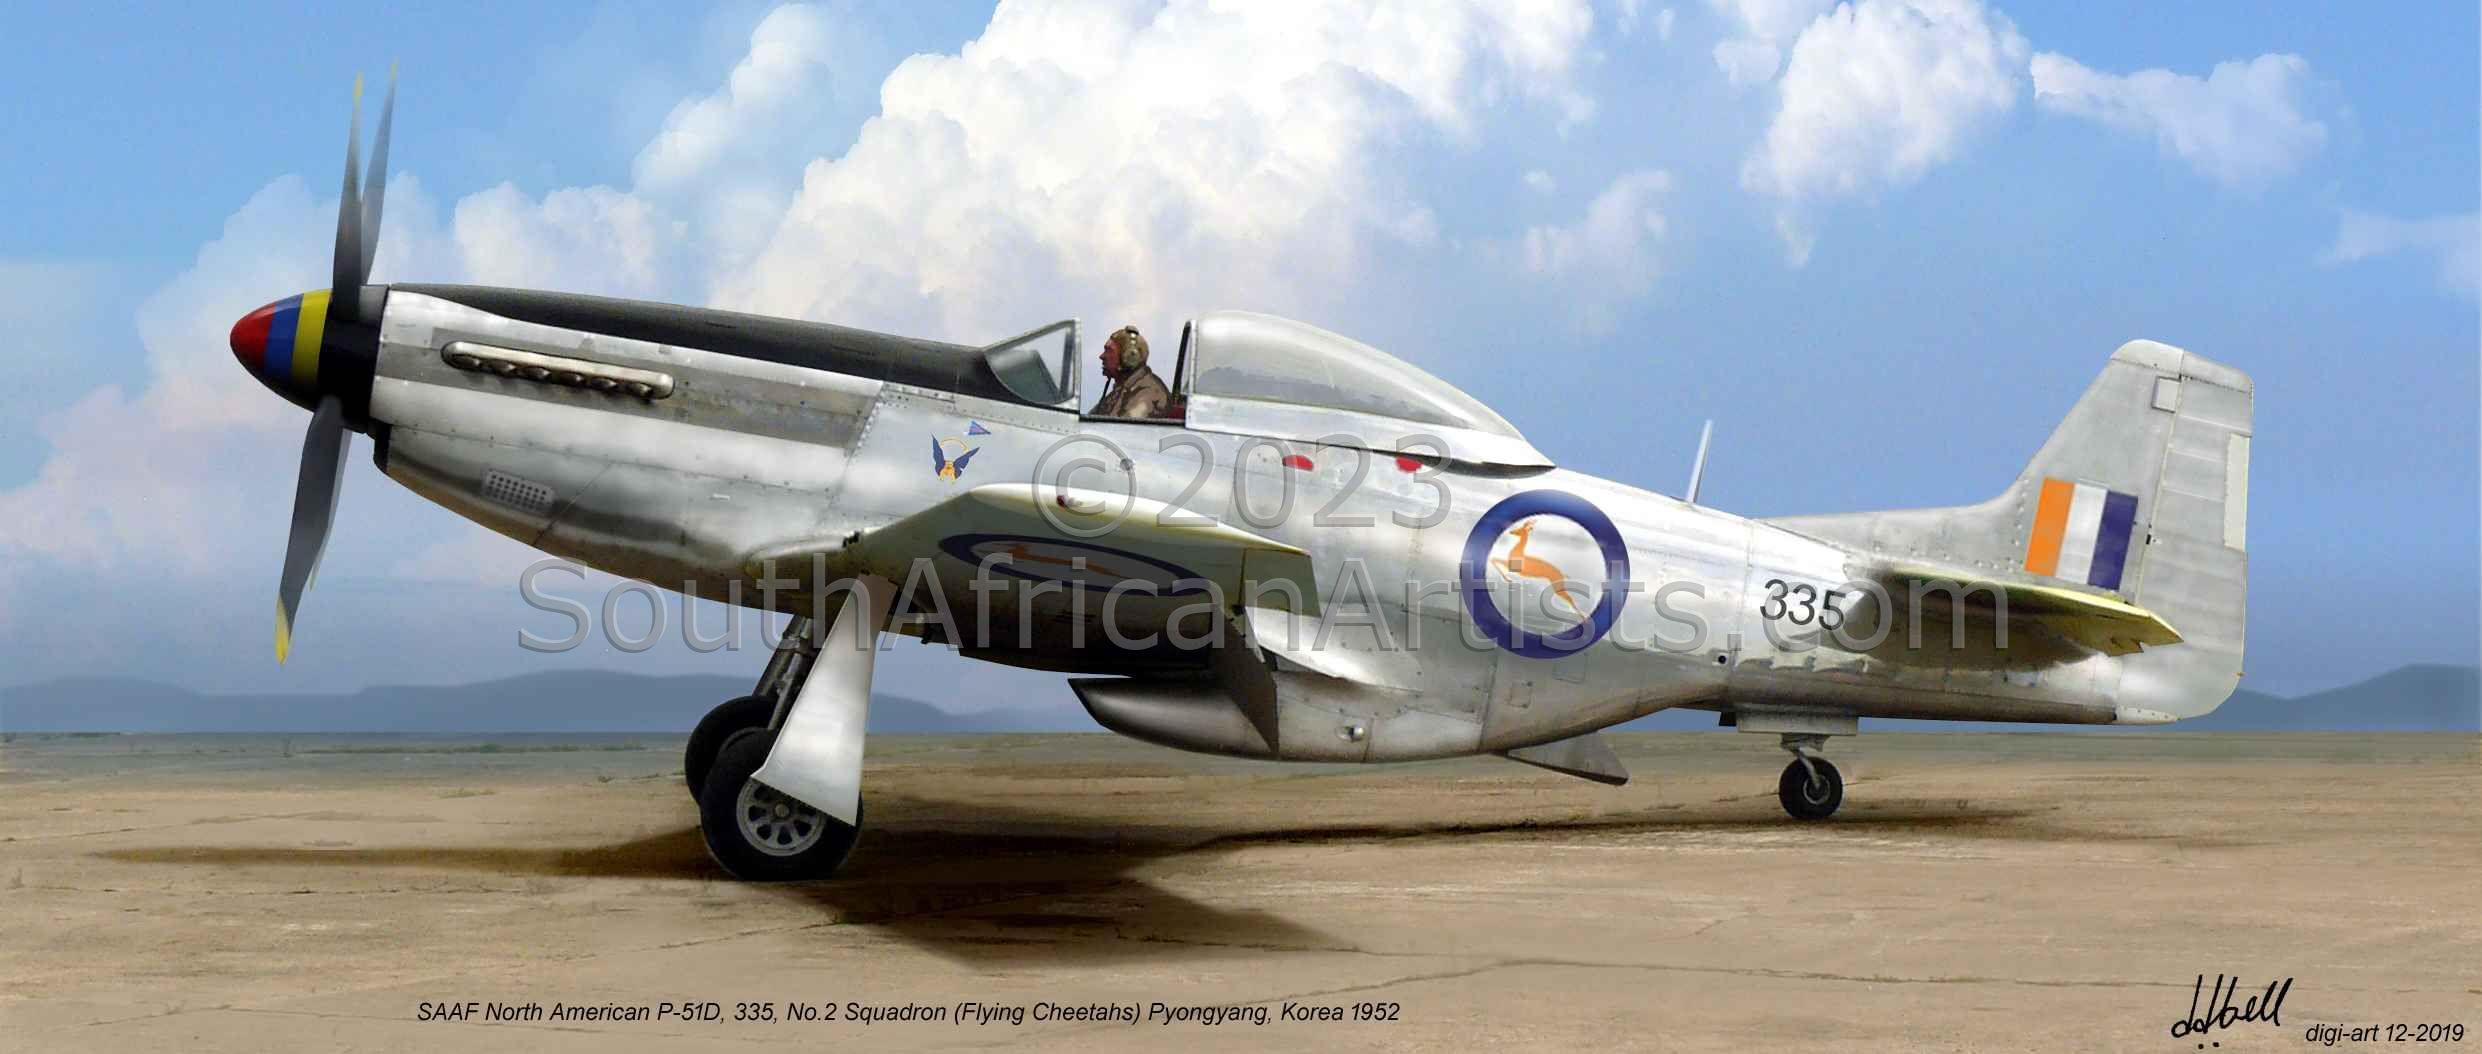 Saaf Mustang P-51d Korea